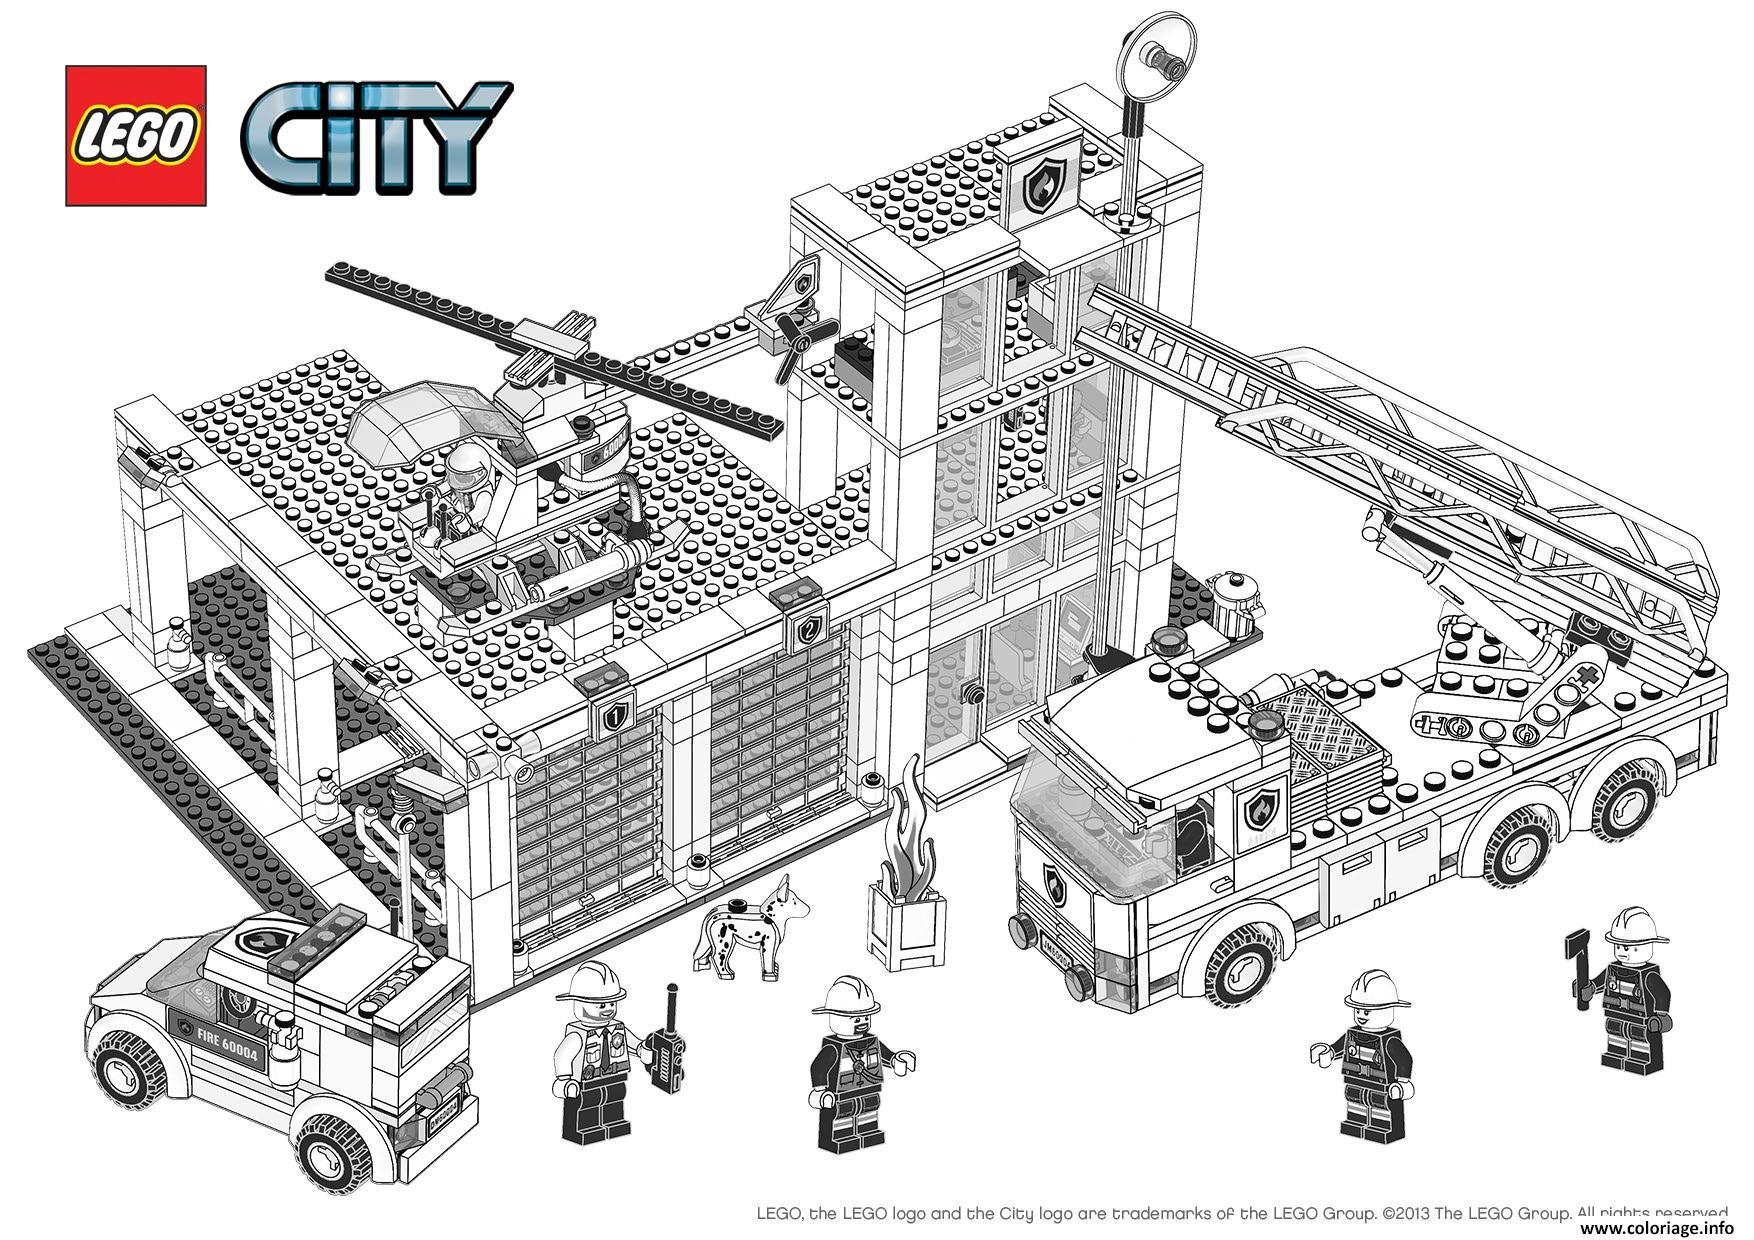 Coloriage Lego City Pompier – 123Coloriage concernant Dessin Animé Lego City